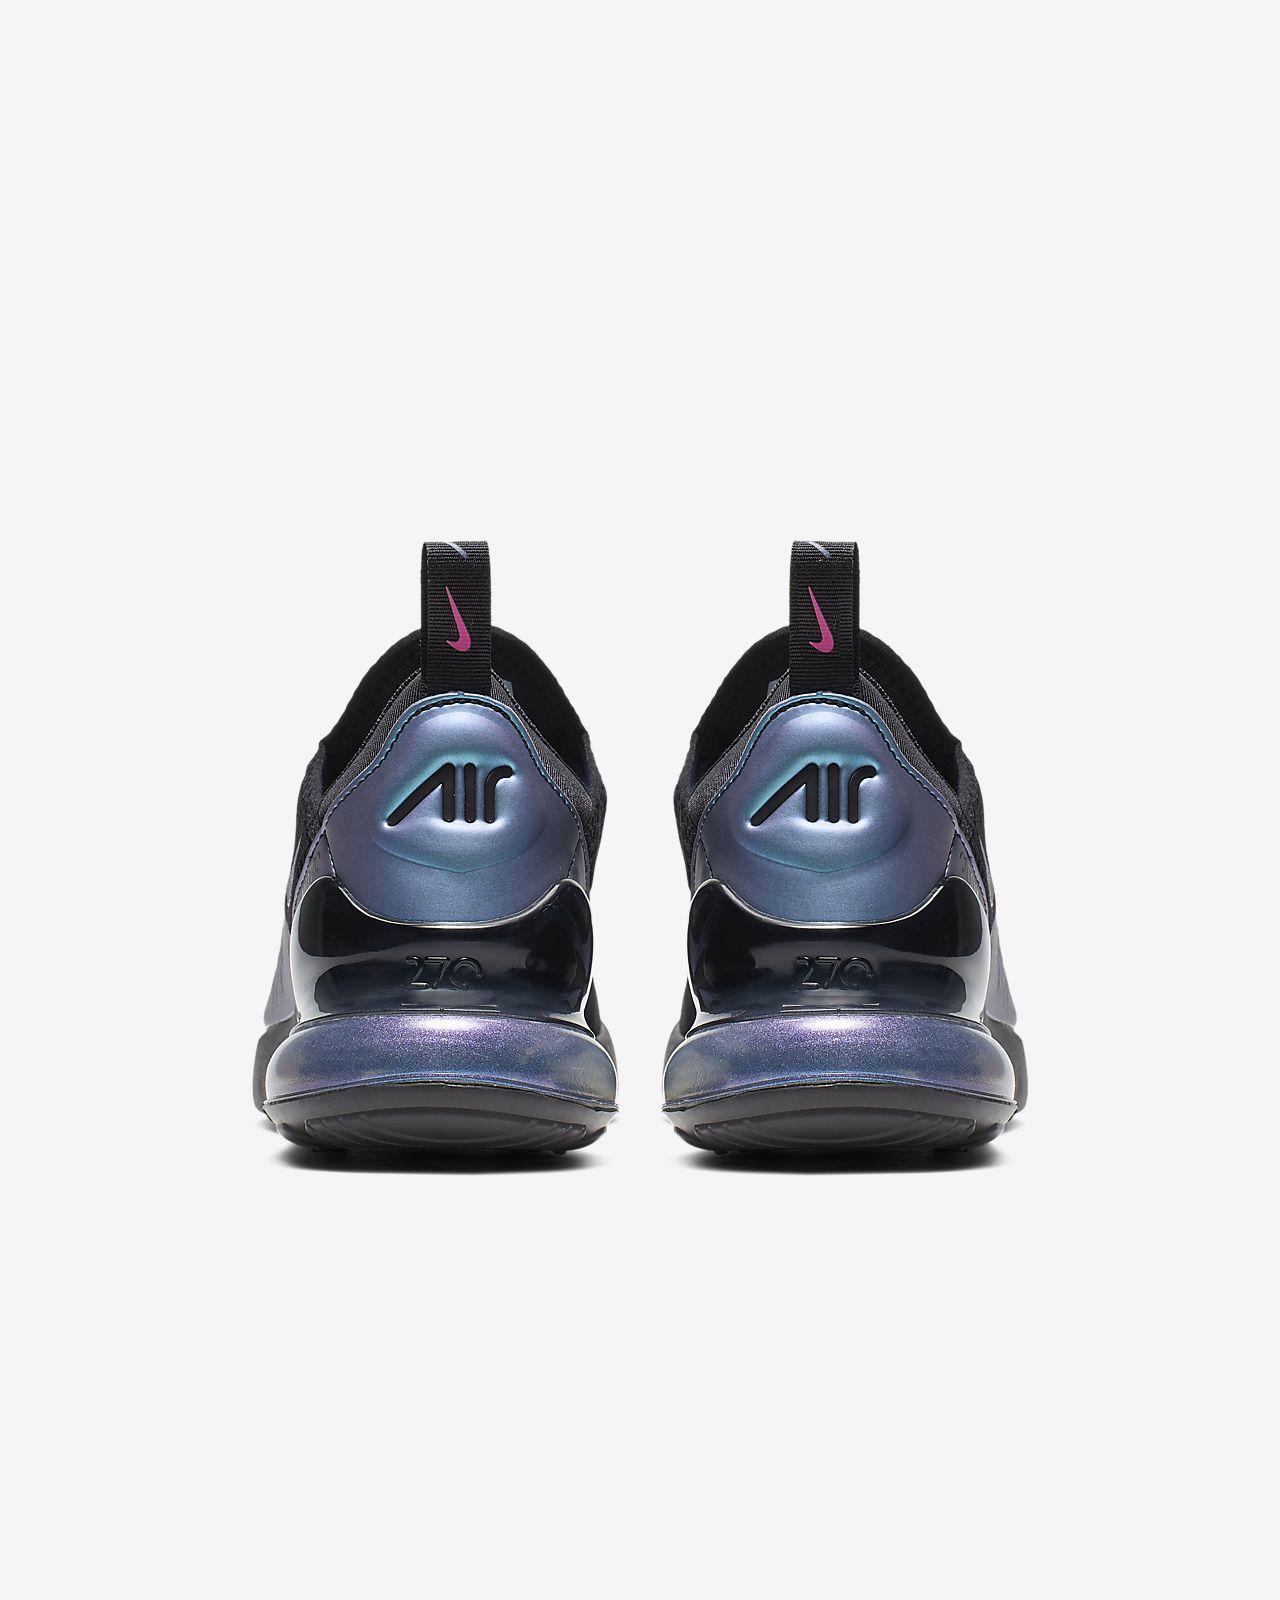 33637d64a6834 Nike Air Max 270 Zapatillas - Mujer. Nike.com ES